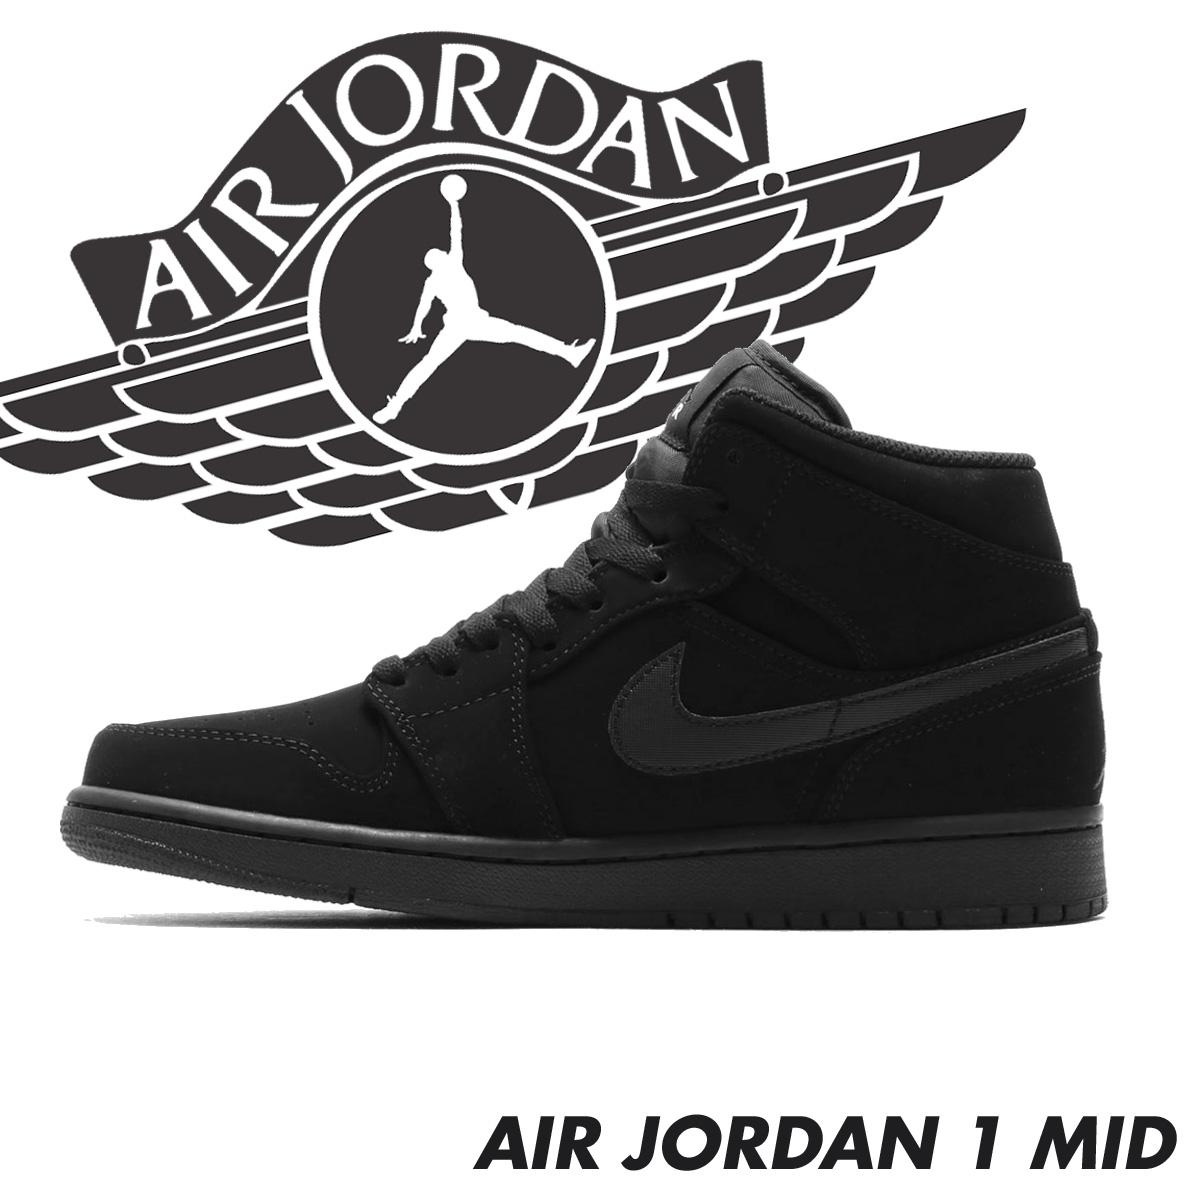 new concept 900d8 eb8f3 NIKE Nike Air Jordan 1 sneakers men AIR JORDAN 1 MID 554,724-040 black